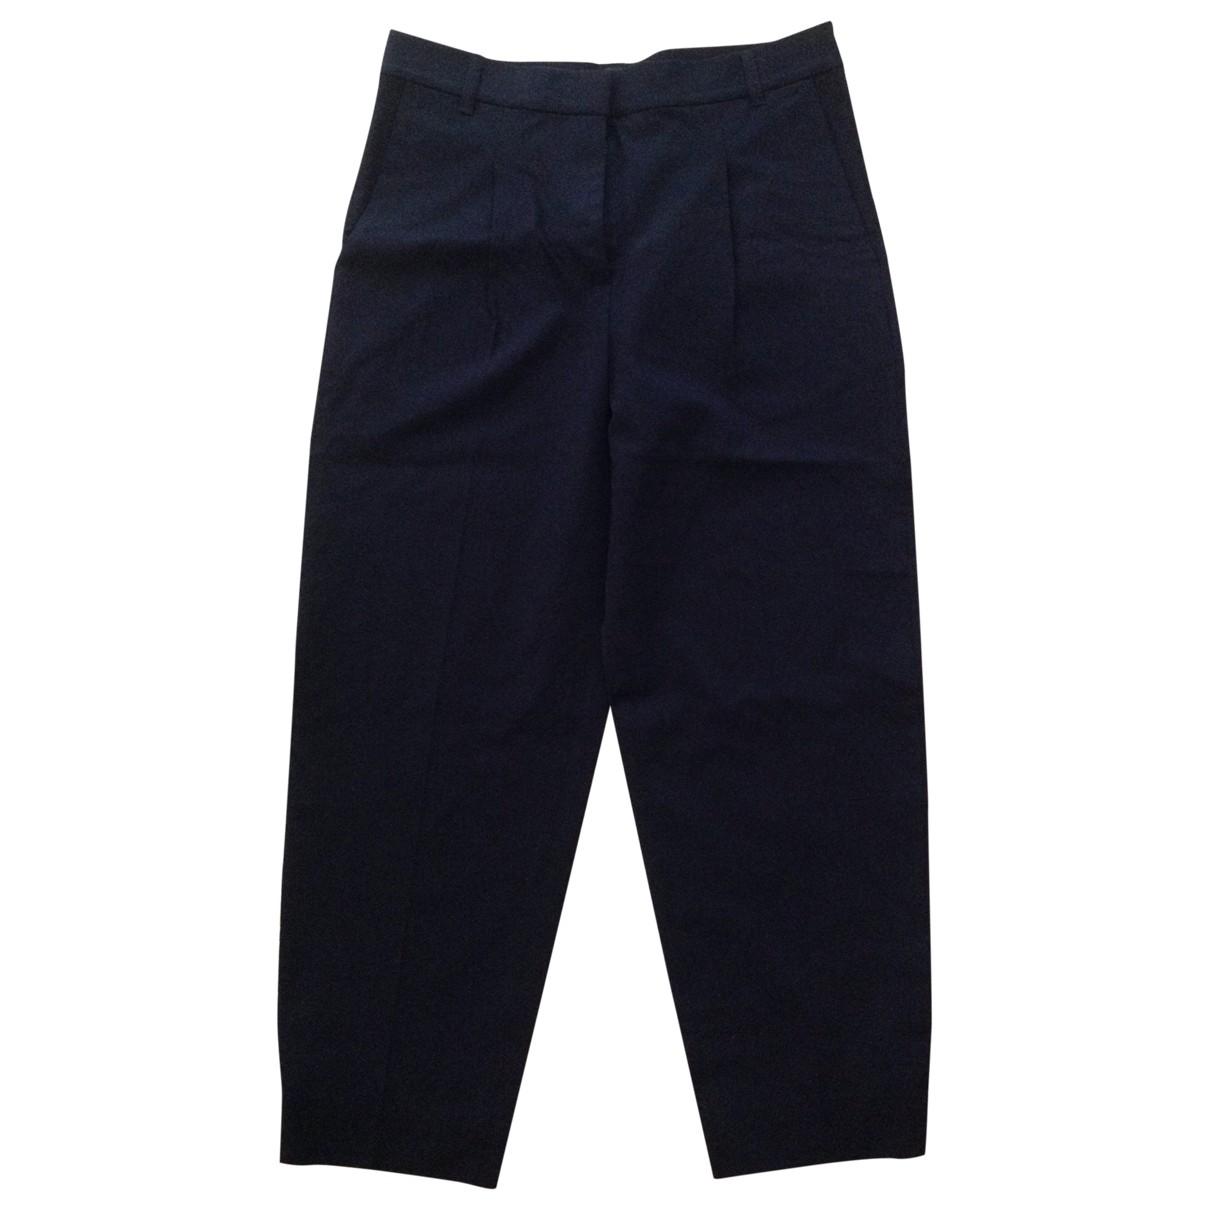 Cos \N Navy Wool Trousers for Women 36 FR